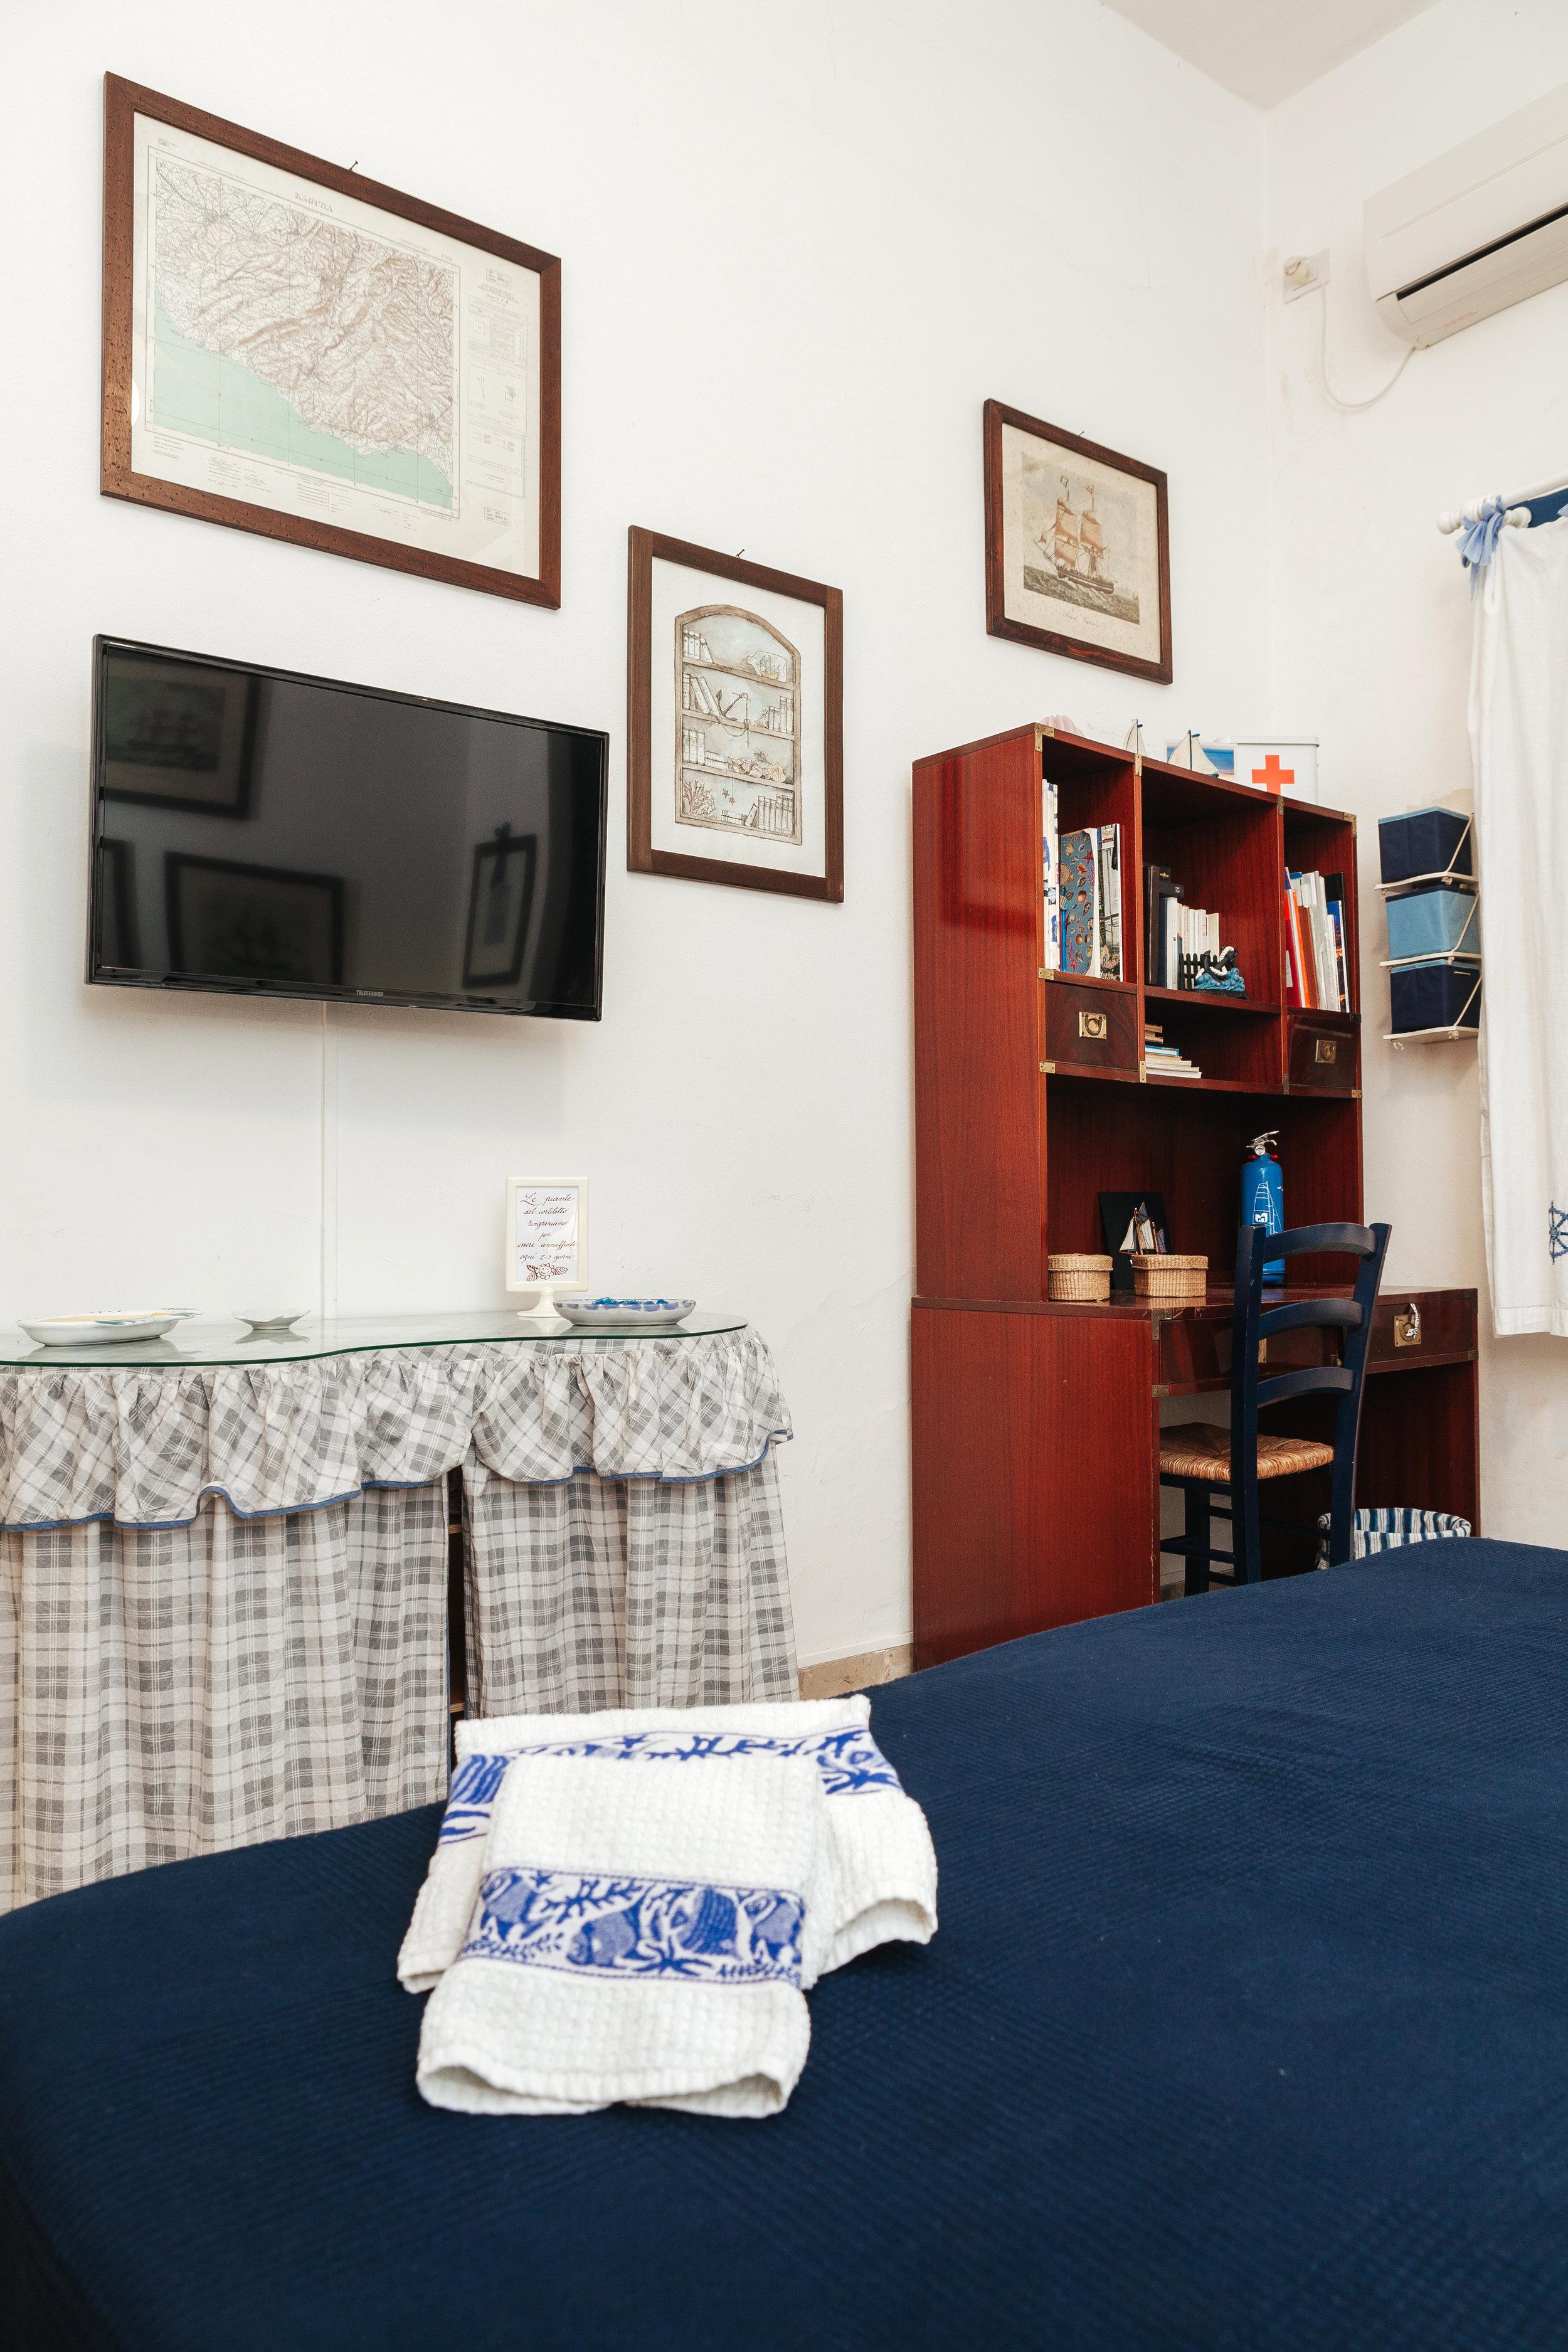 19sampieri-casa-vacanze-sicilia-appartamento-sicily-holiday-apartment-casazzurra-italia-italy.jpg